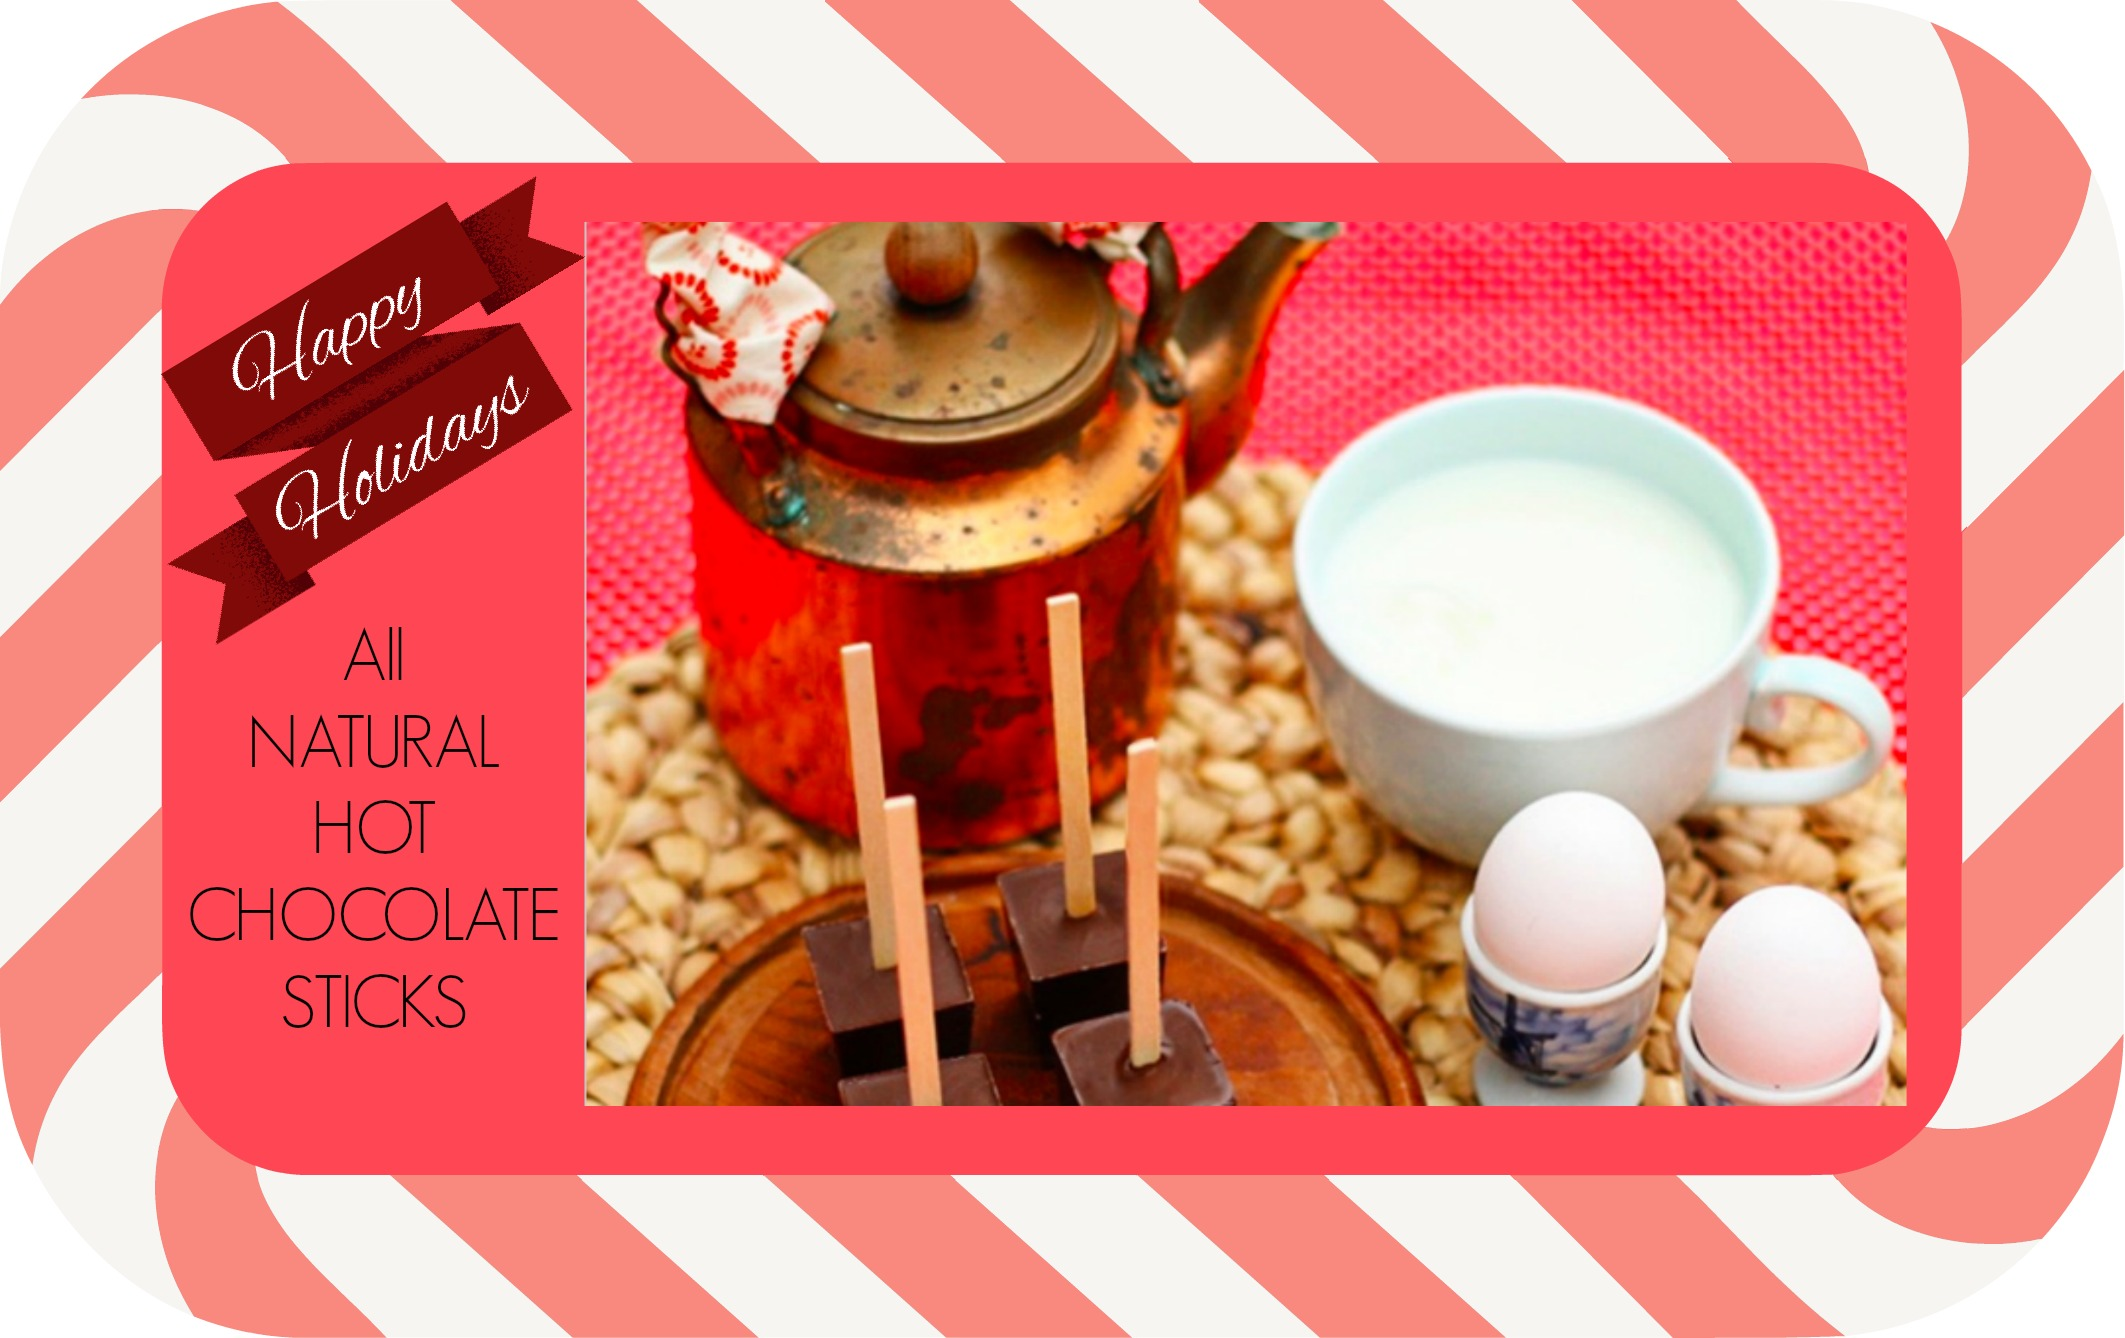 All Natural Hot Chocolate Sticks